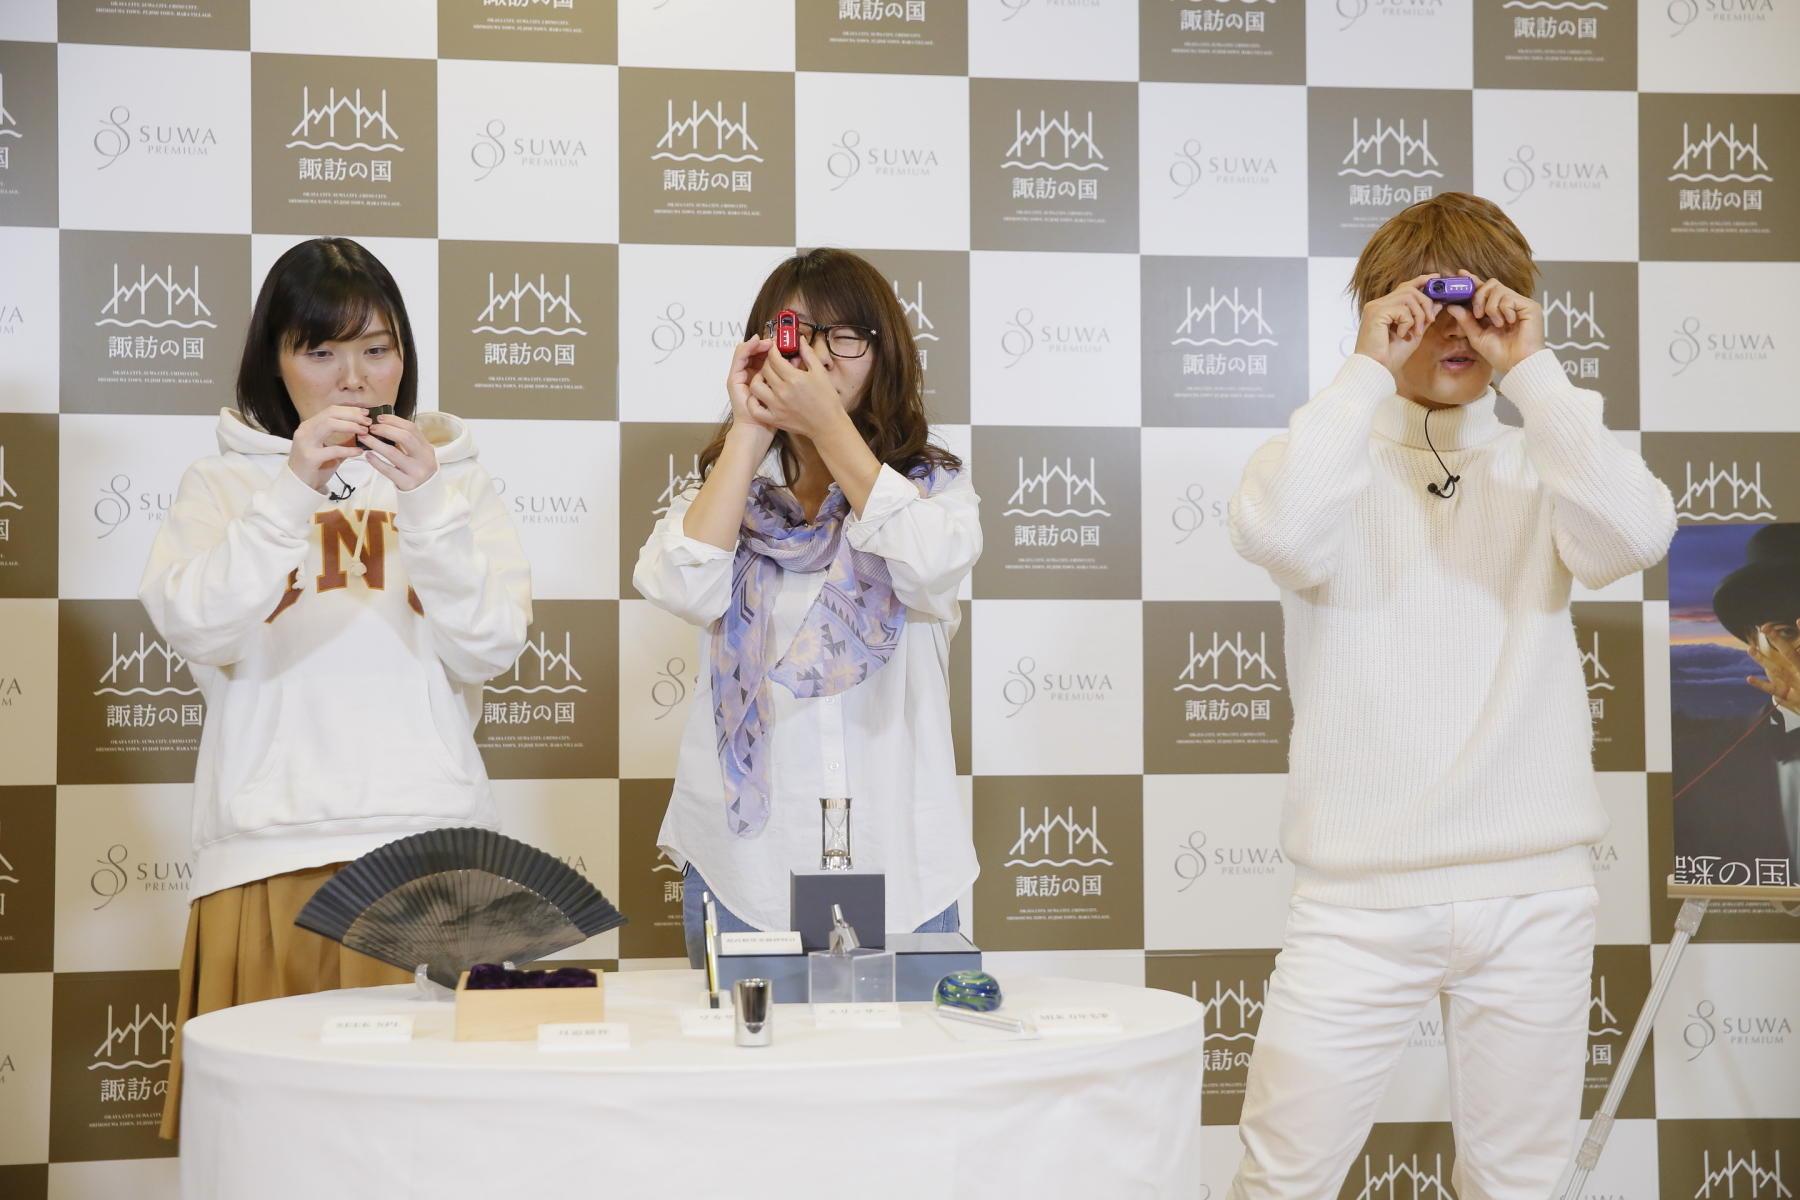 http://news.yoshimoto.co.jp/20171108161608-ac5929ff88012bafc649aa8e1f9c573c121342fa.jpg